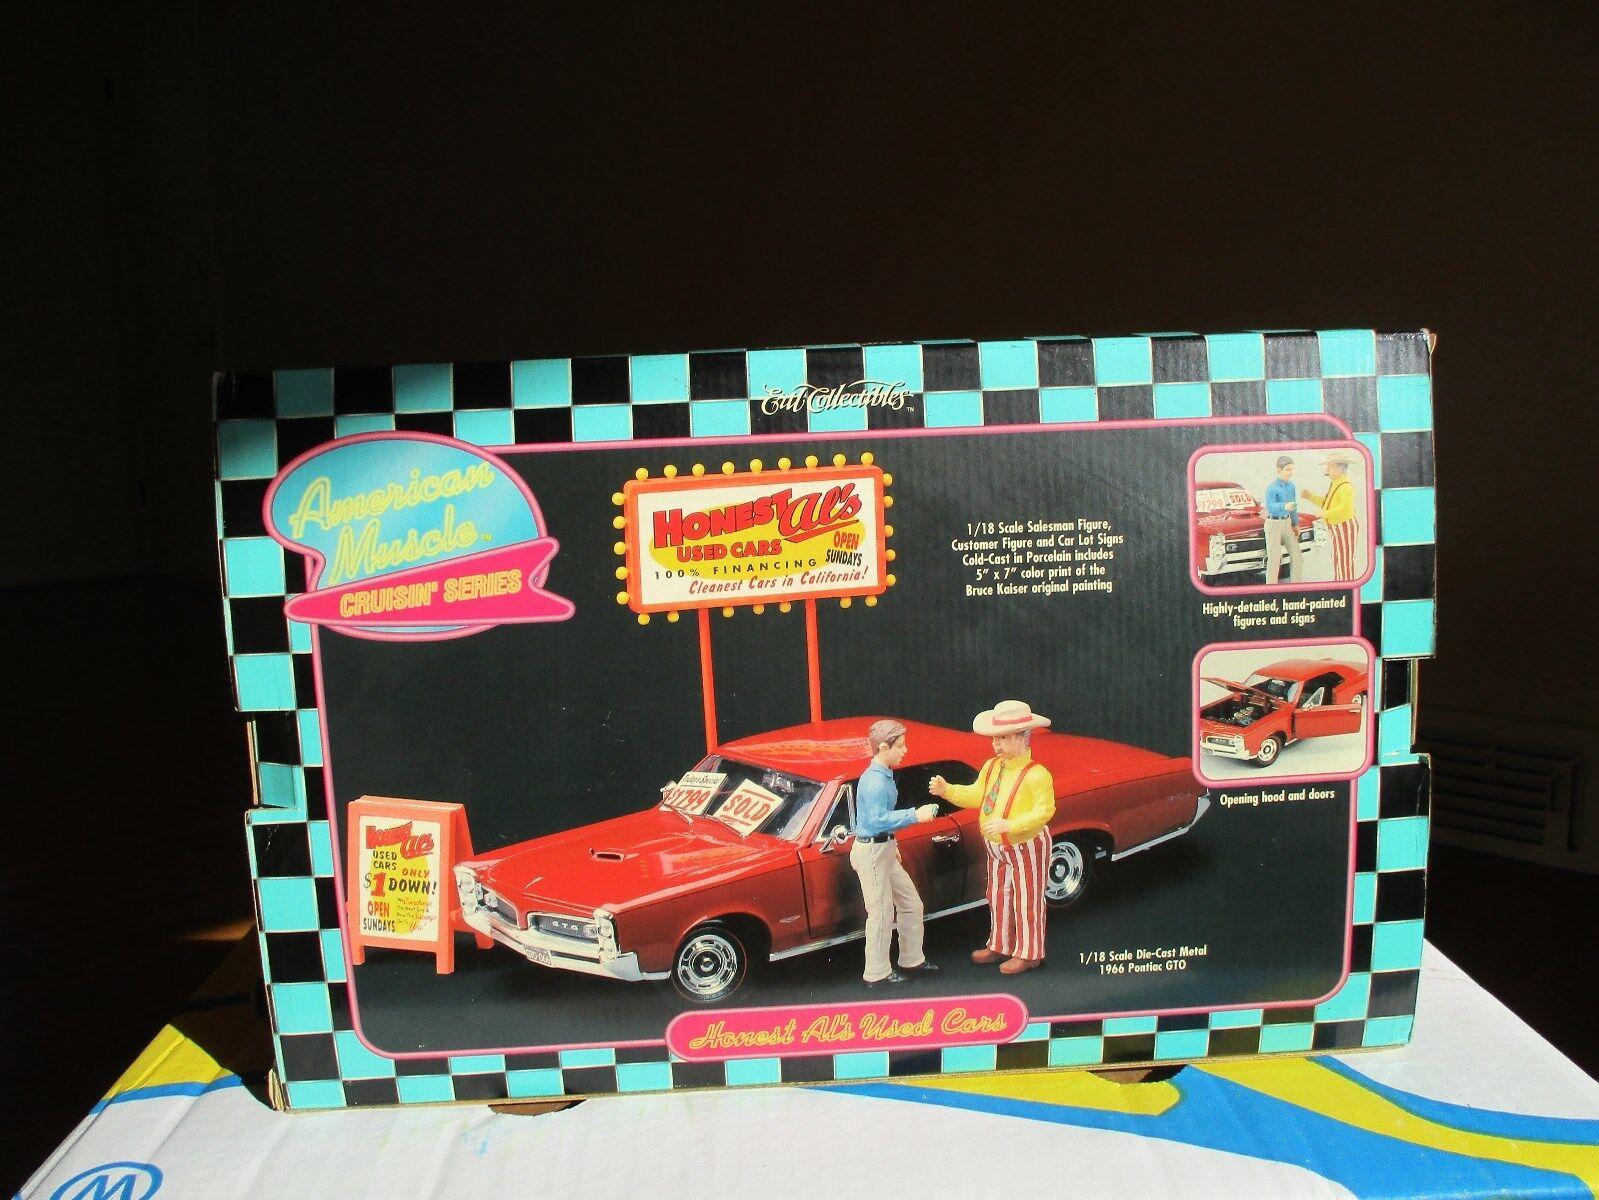 1 18 Die Cast & Porcelana Ertl Diorama  honesto al de coches usados  MIB difícil de encontrar